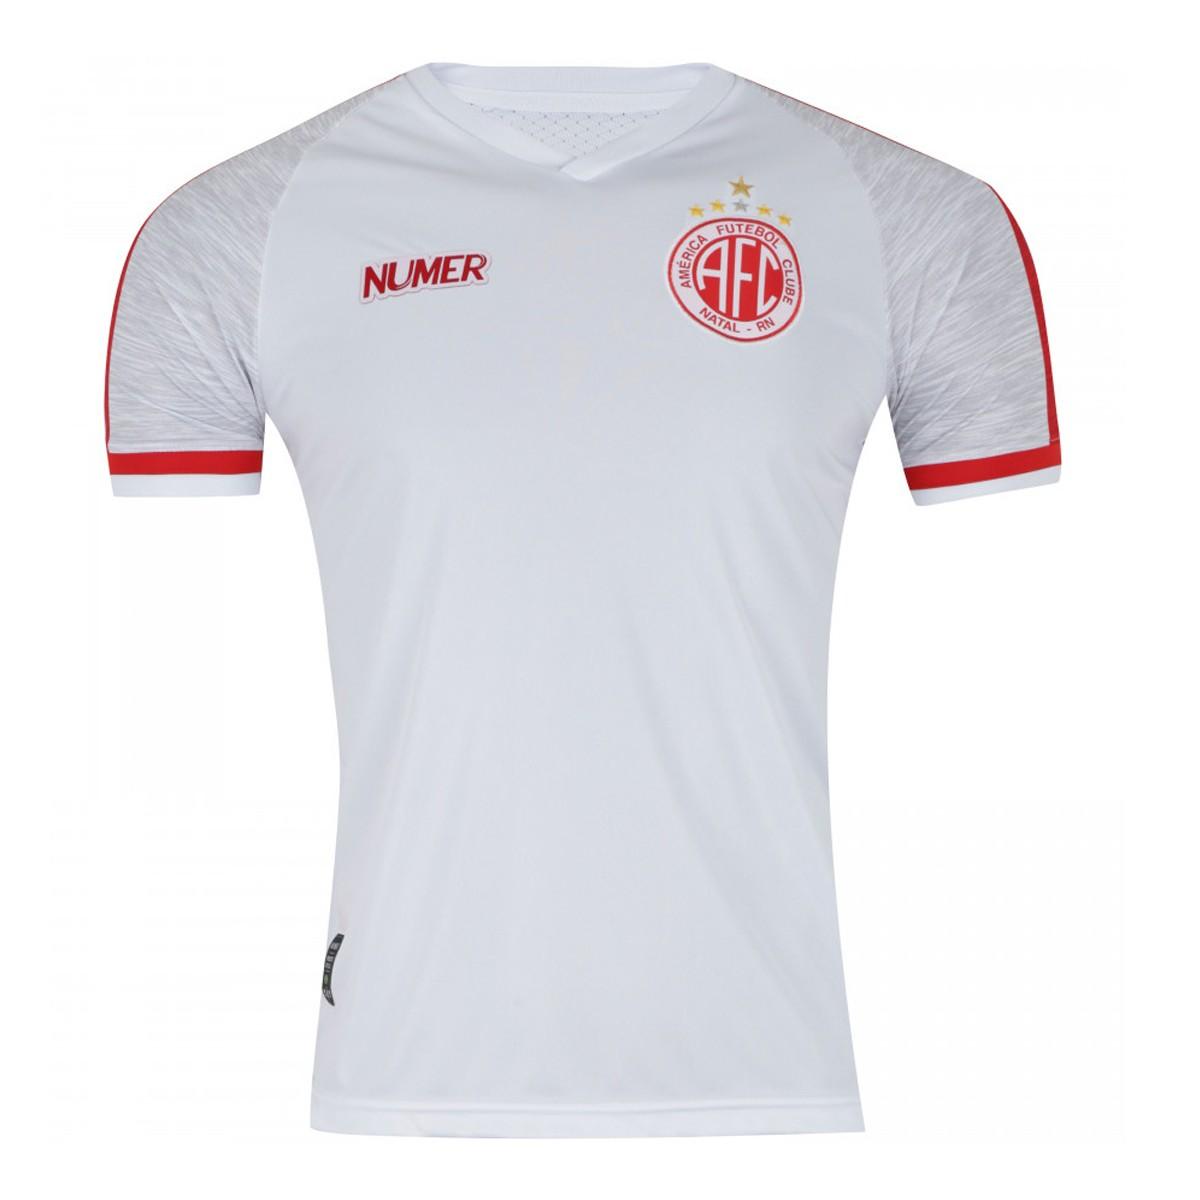 Camisa América RN - Of 2 -Numer - 2019-20 Masculina